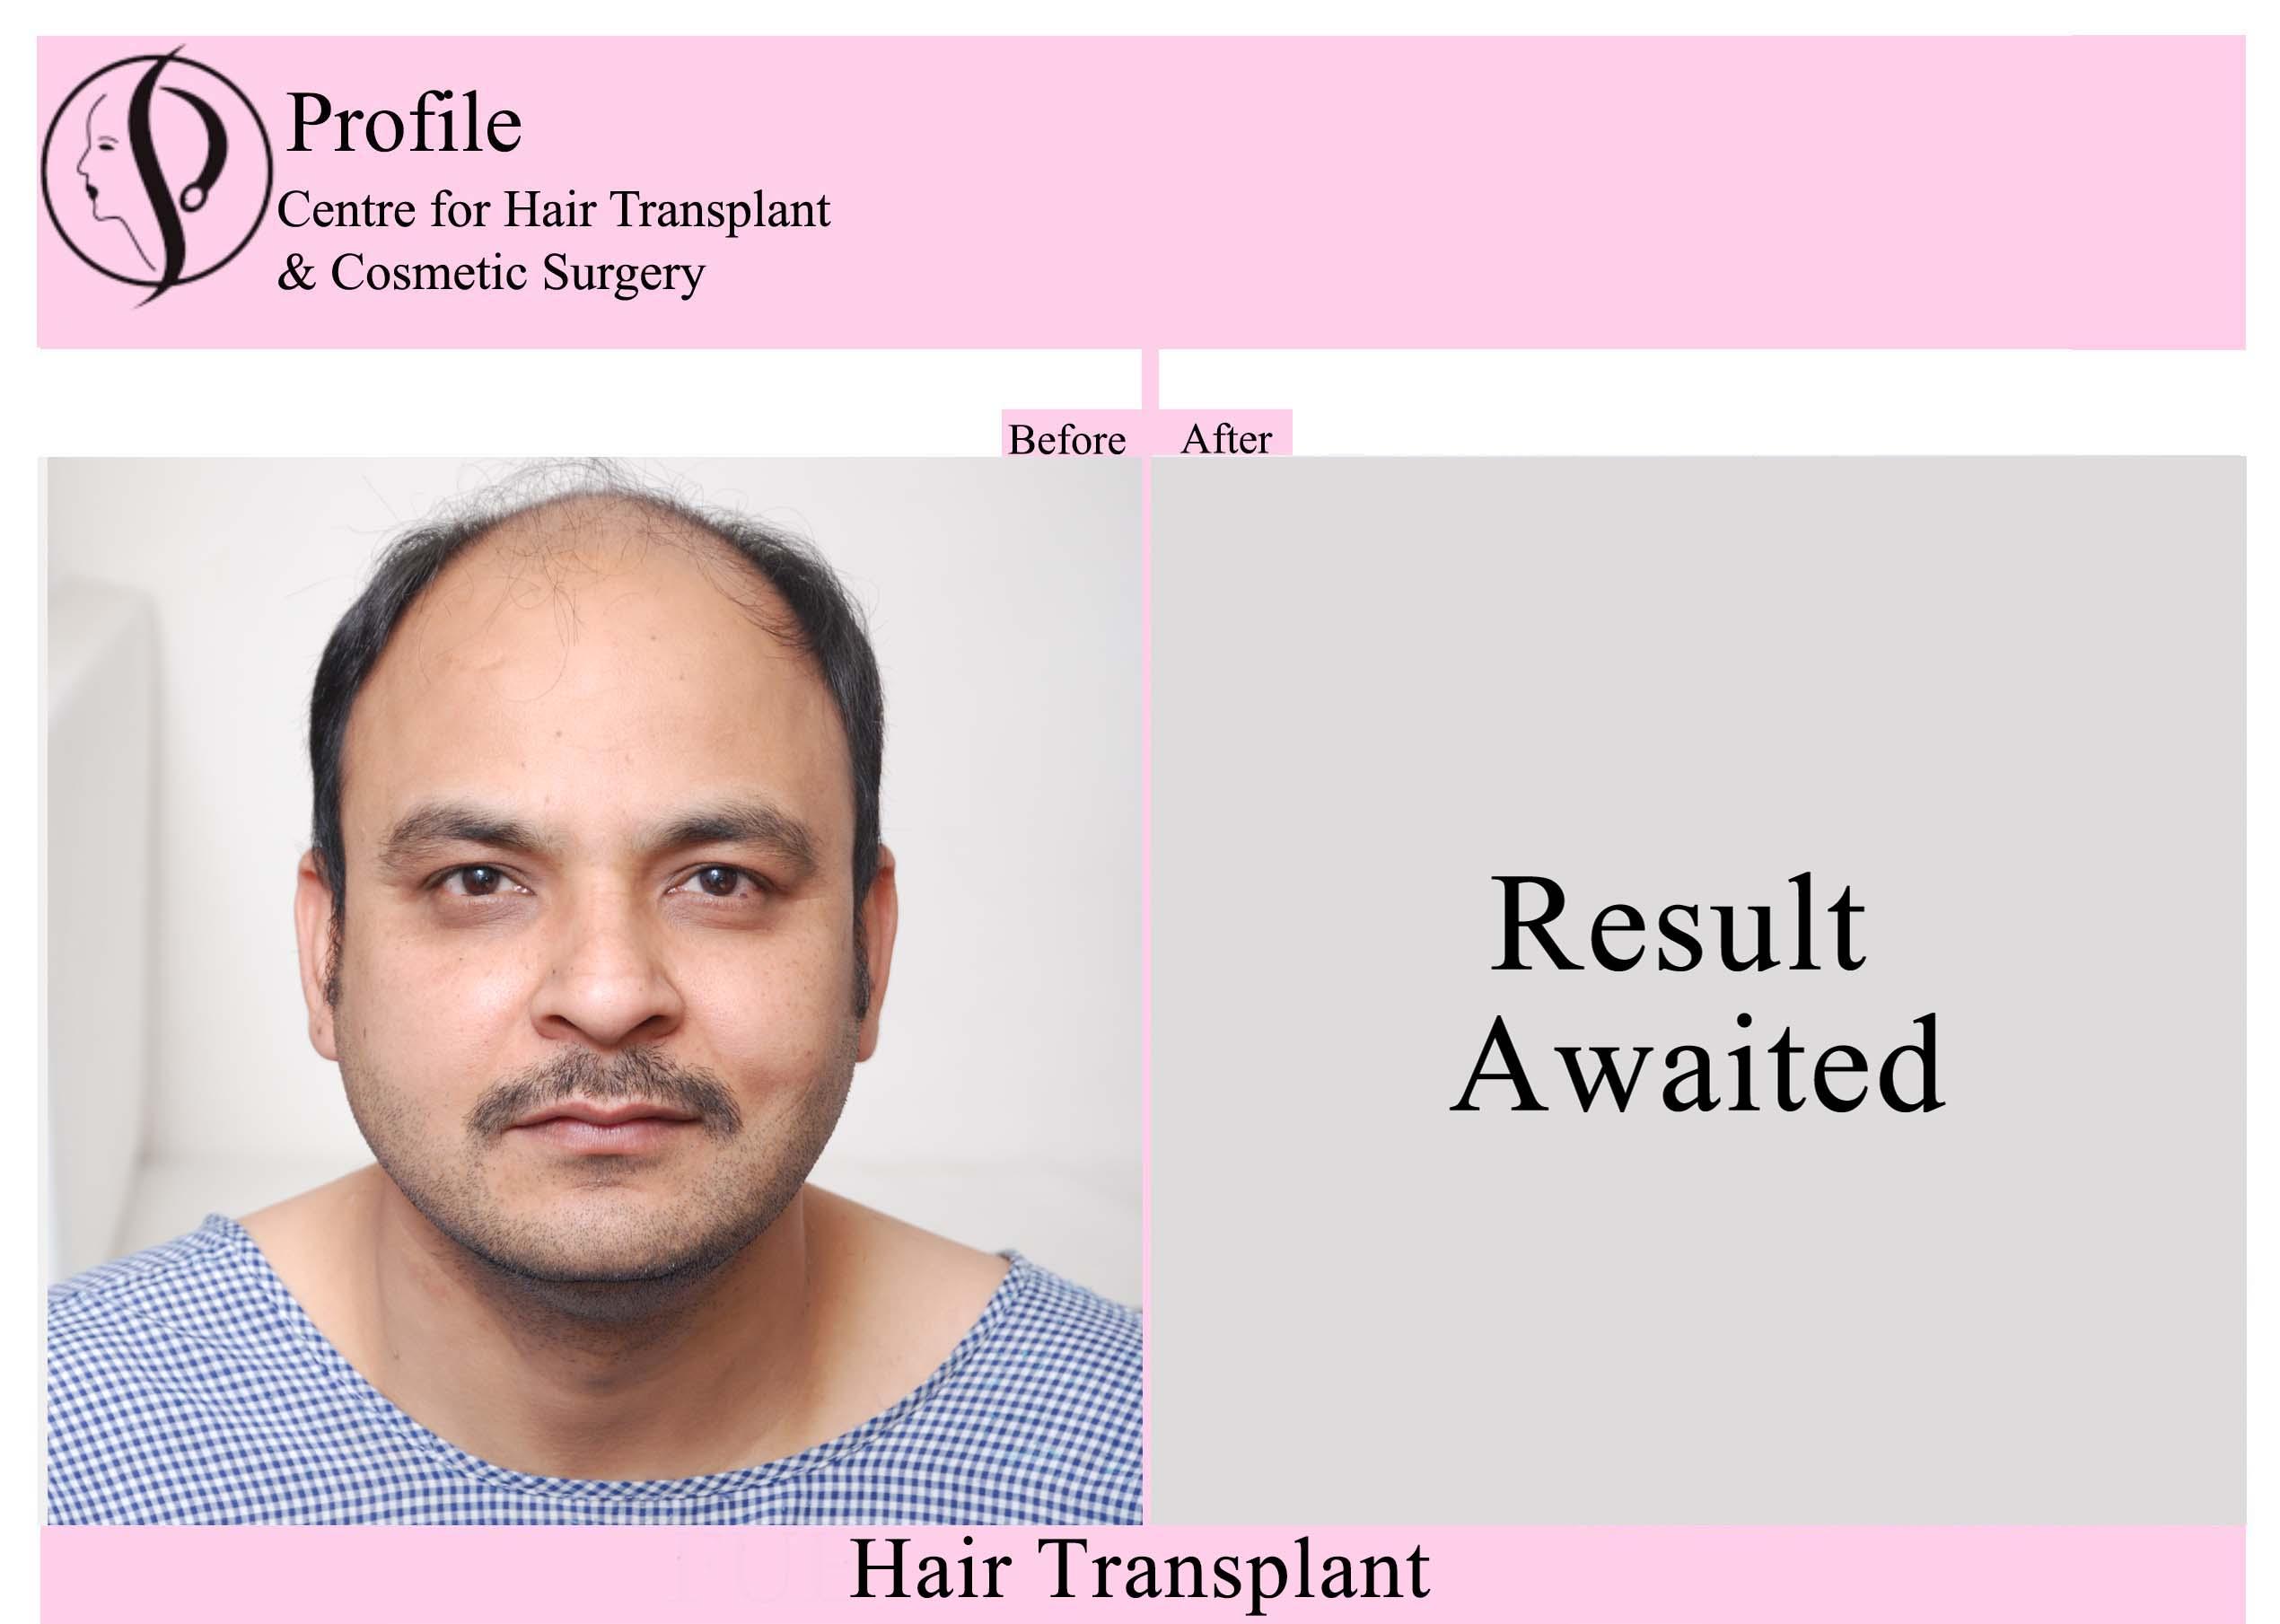 Dr. Rajan Sood